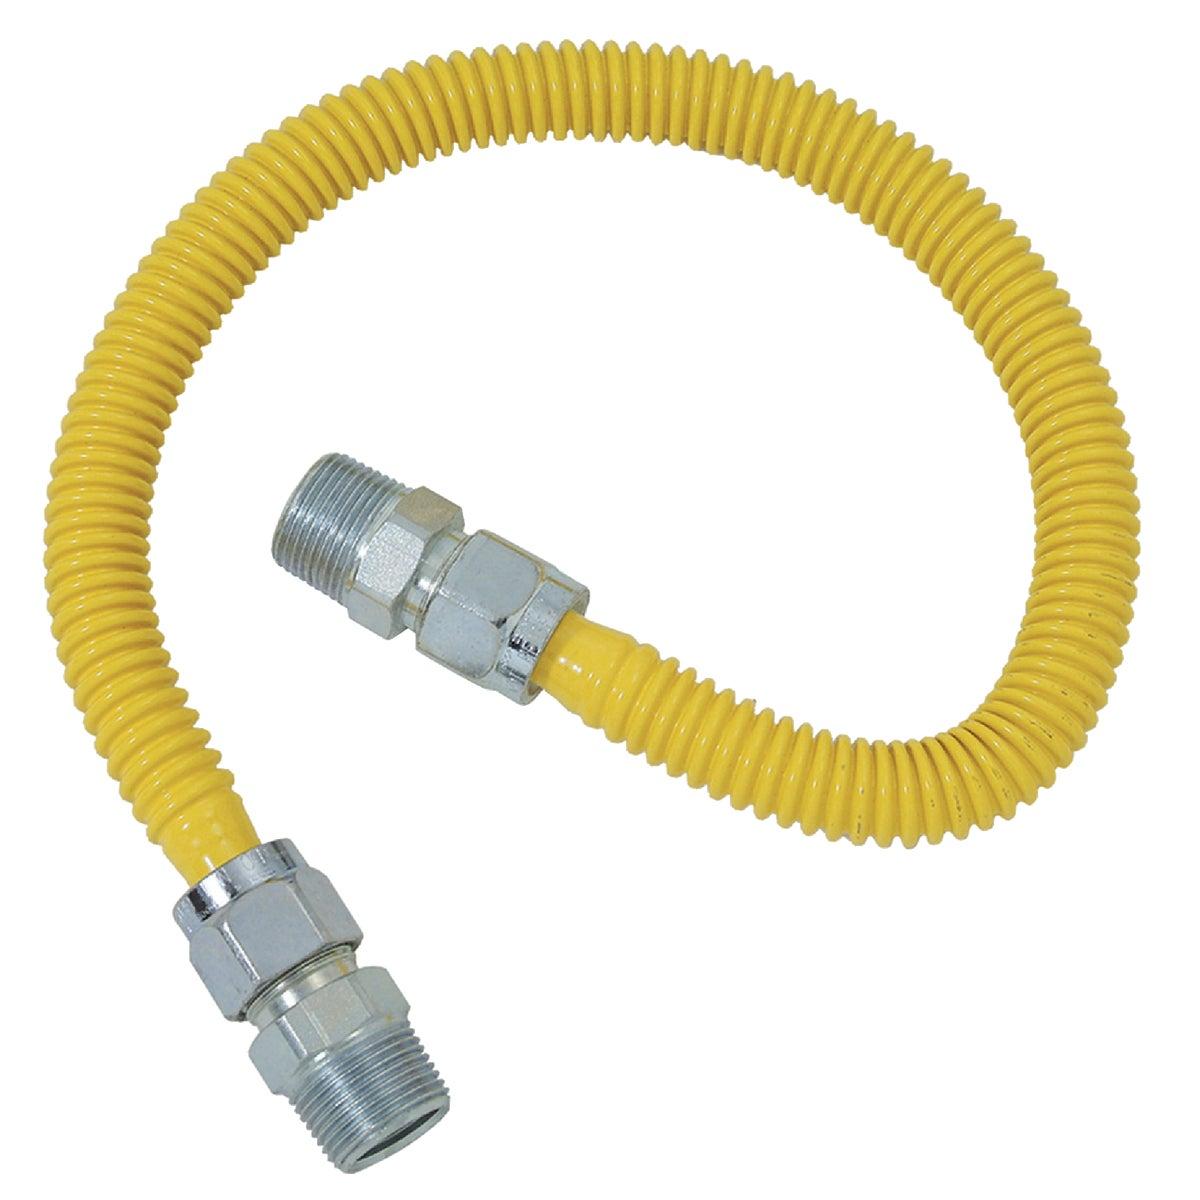 5/8X60 GAS CONNECTOR